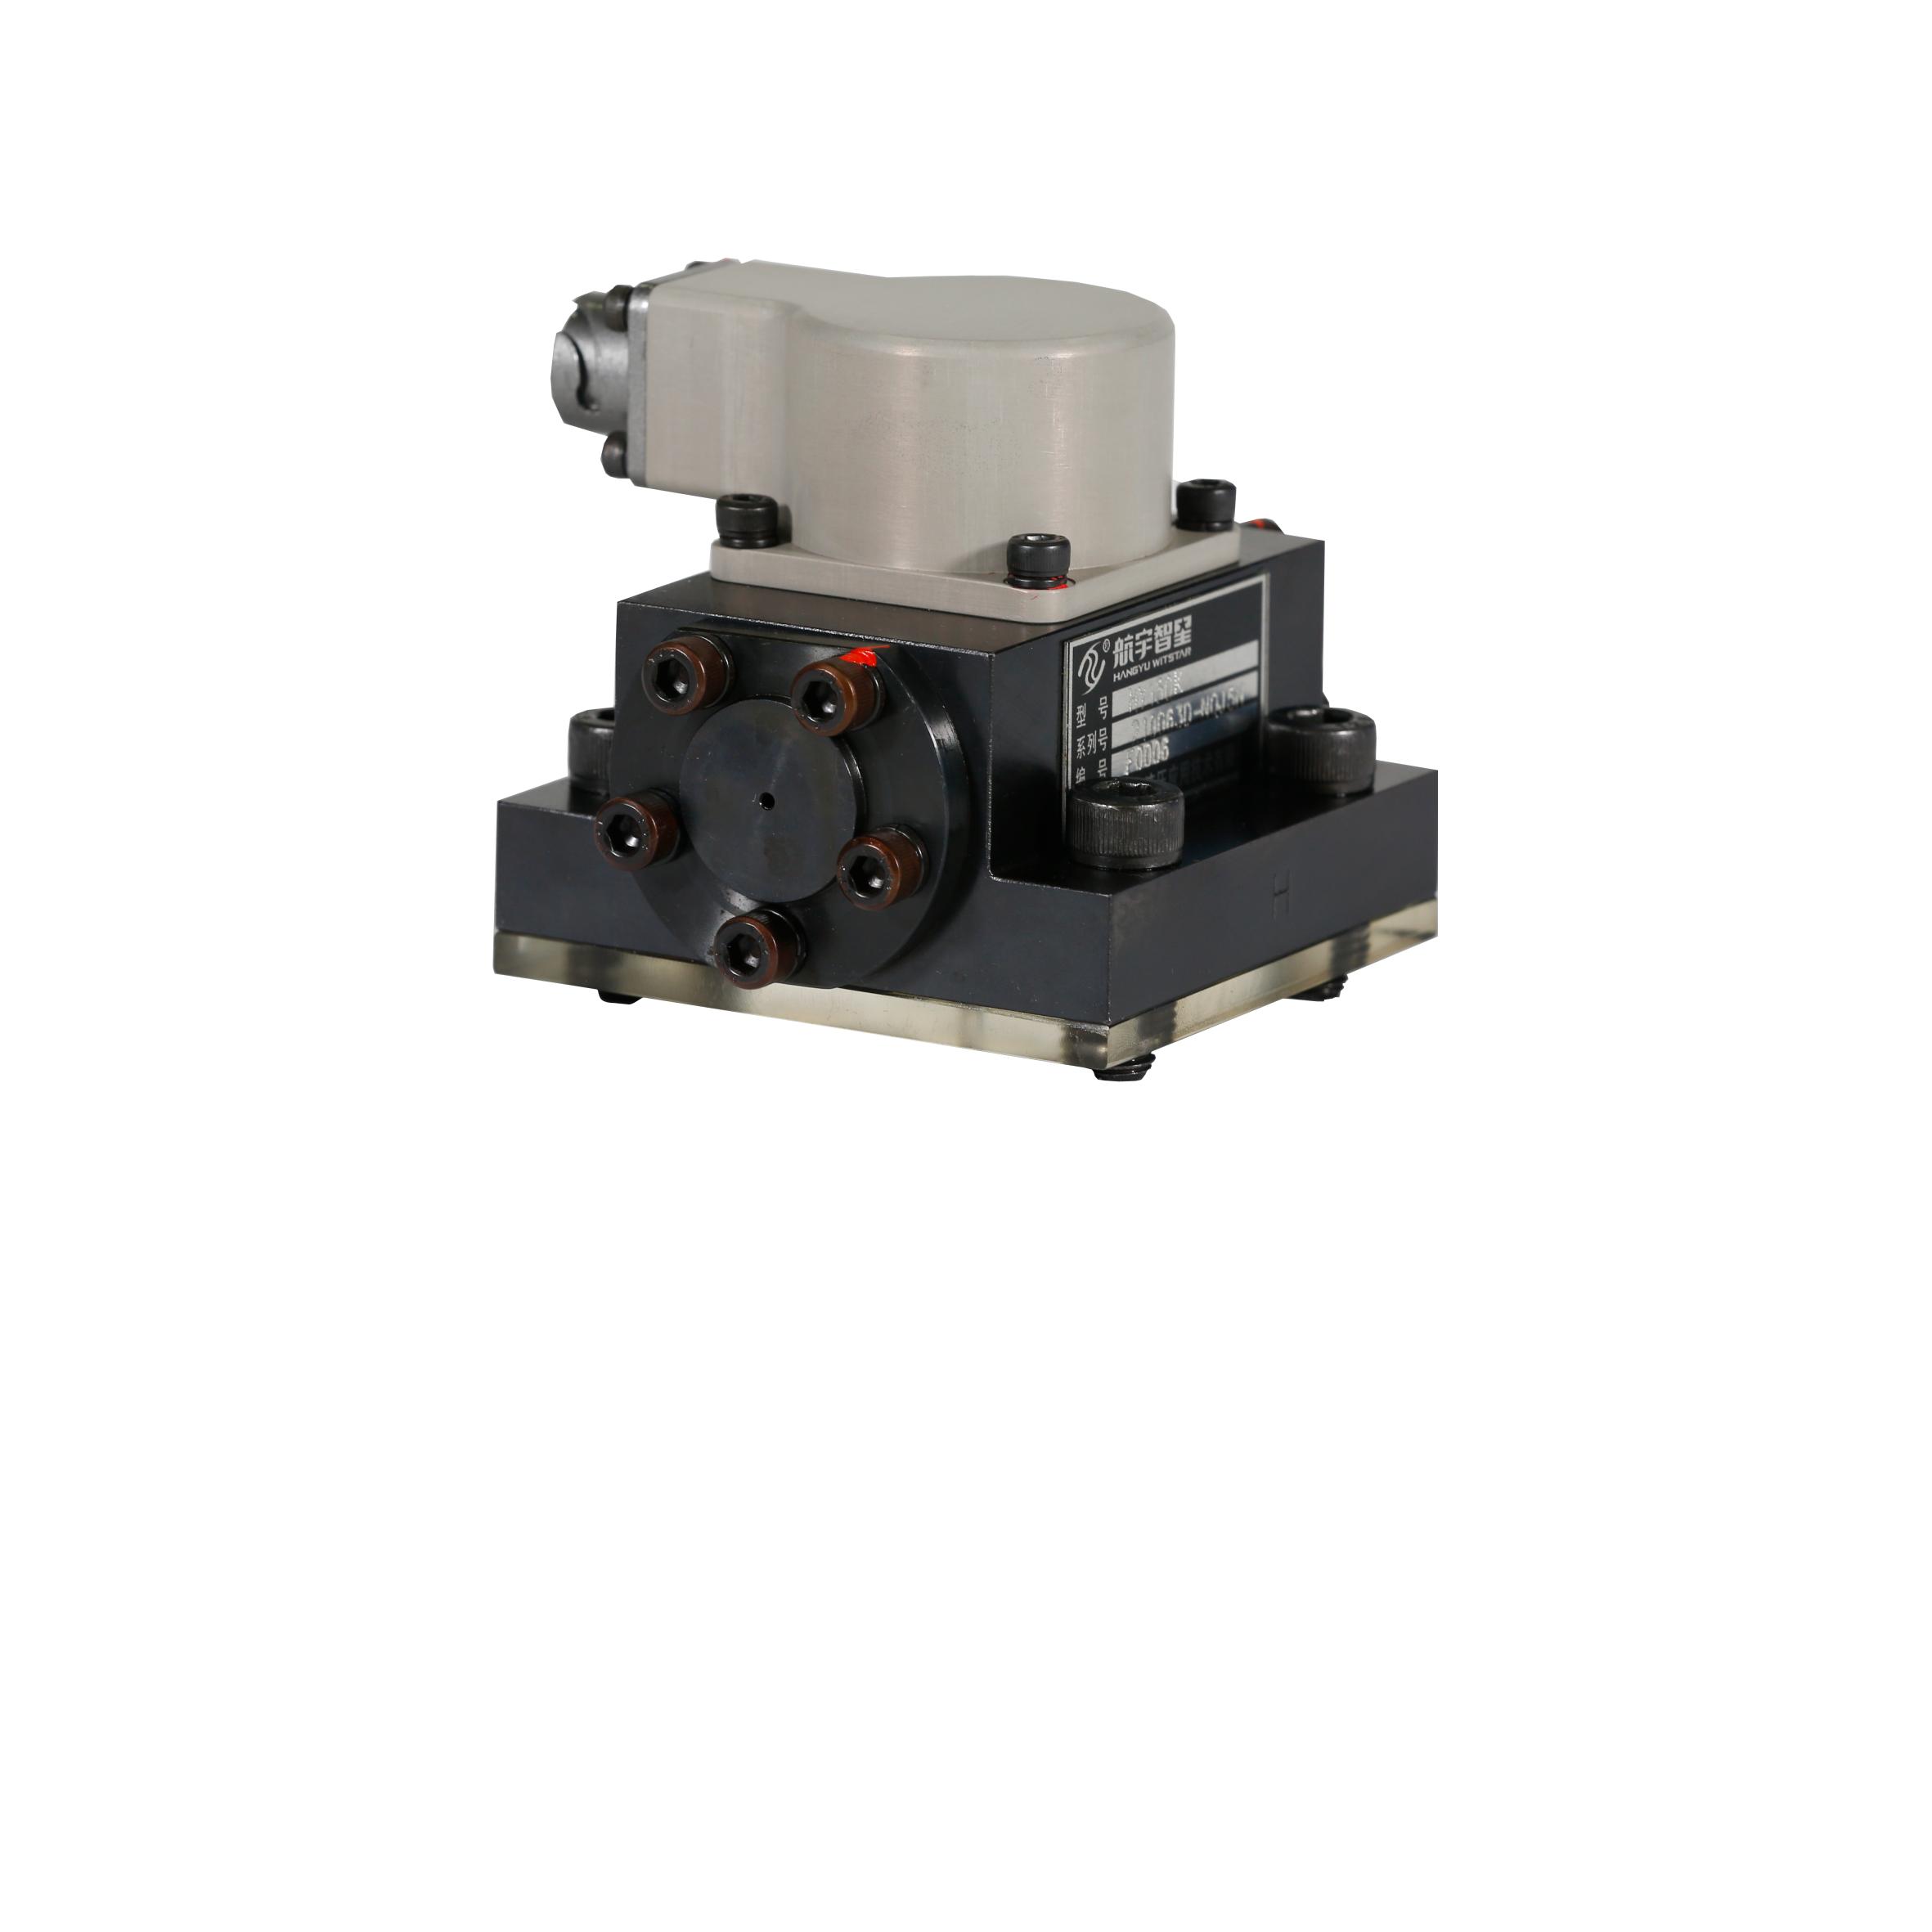 HY(F)150、HY(F)150K 系列电液伺服阀